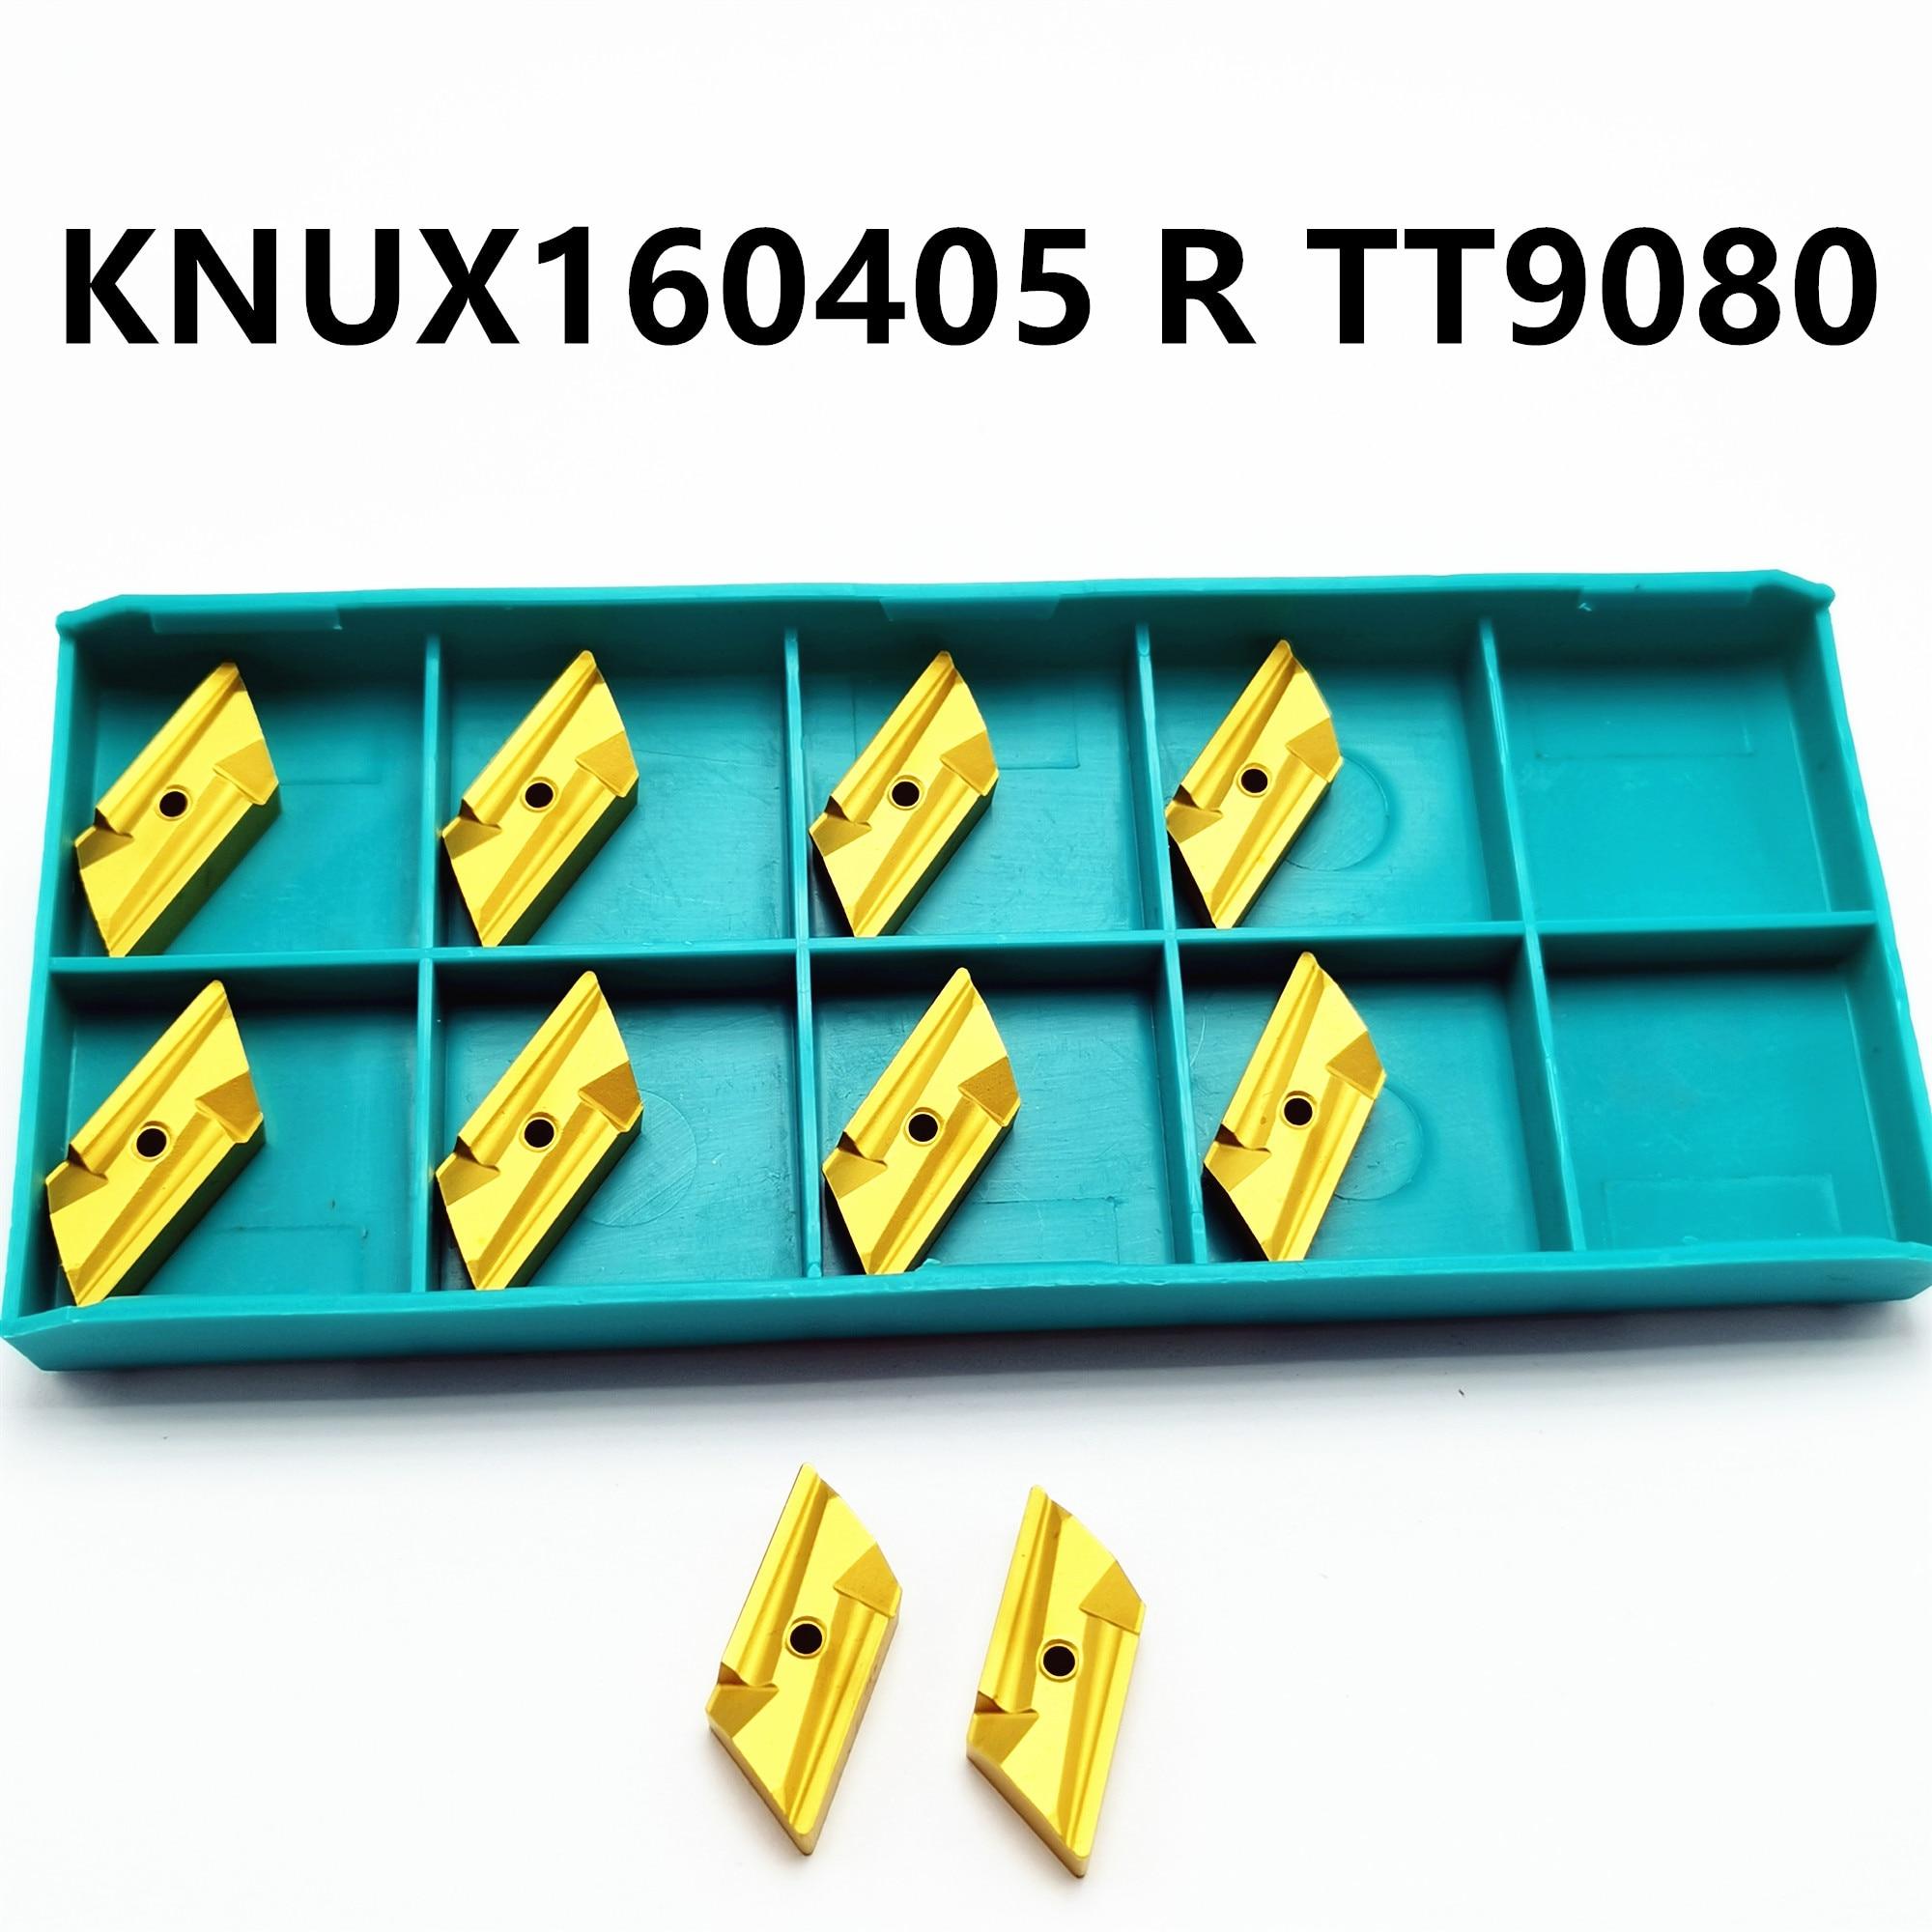 Tungsten Carbide KNUX160405R TT9080 Carbide Insert Turning Tool Turning Milling Cutter CNC Tool KNUX 160405 R KNUX